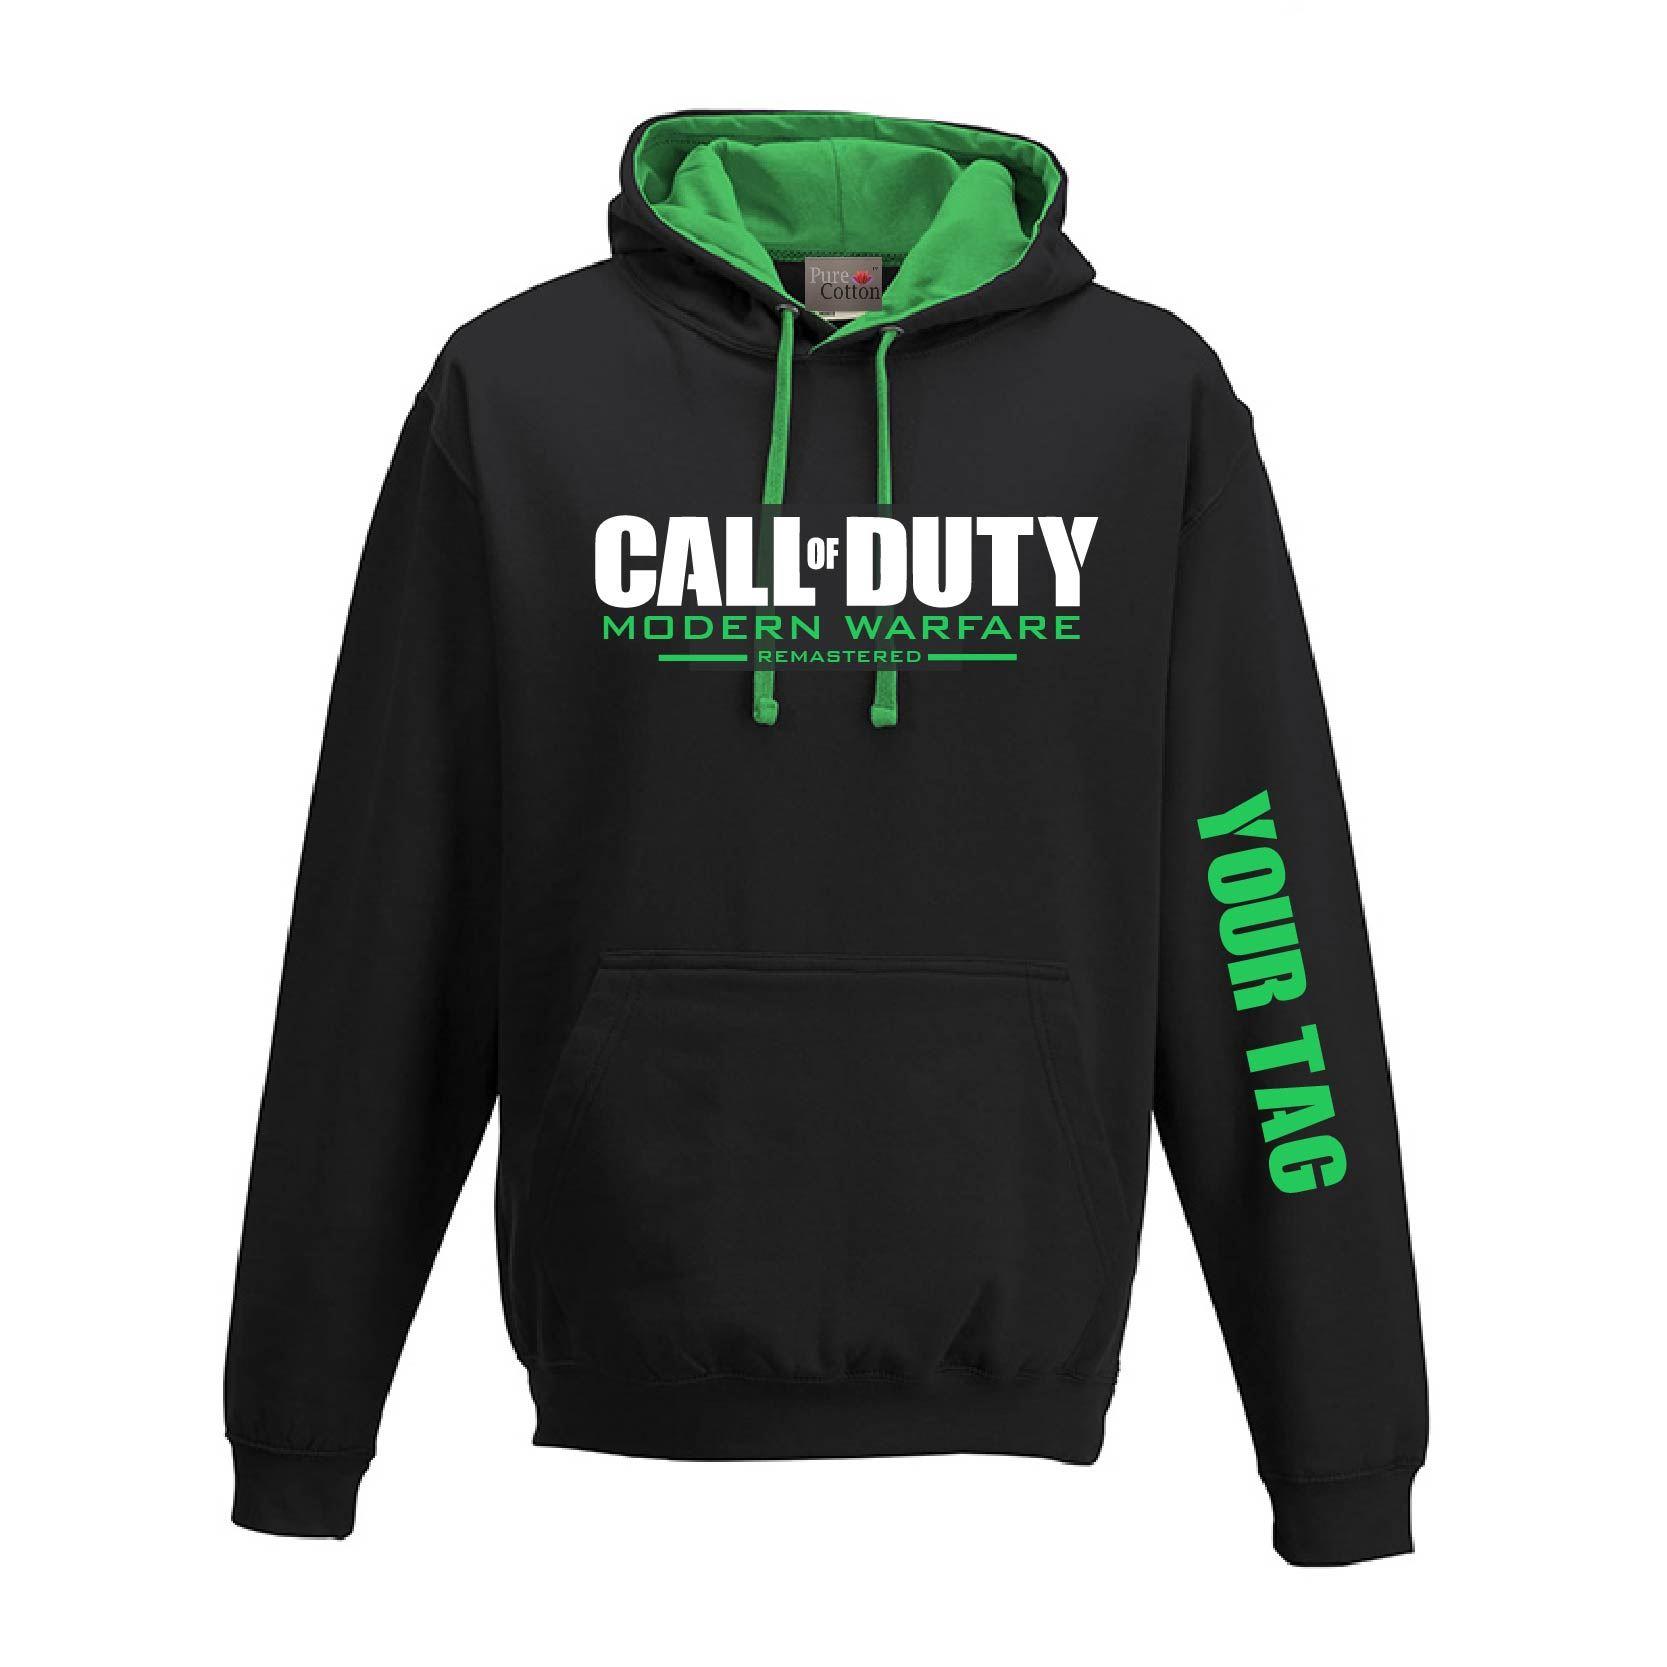 Call of duty hoodies